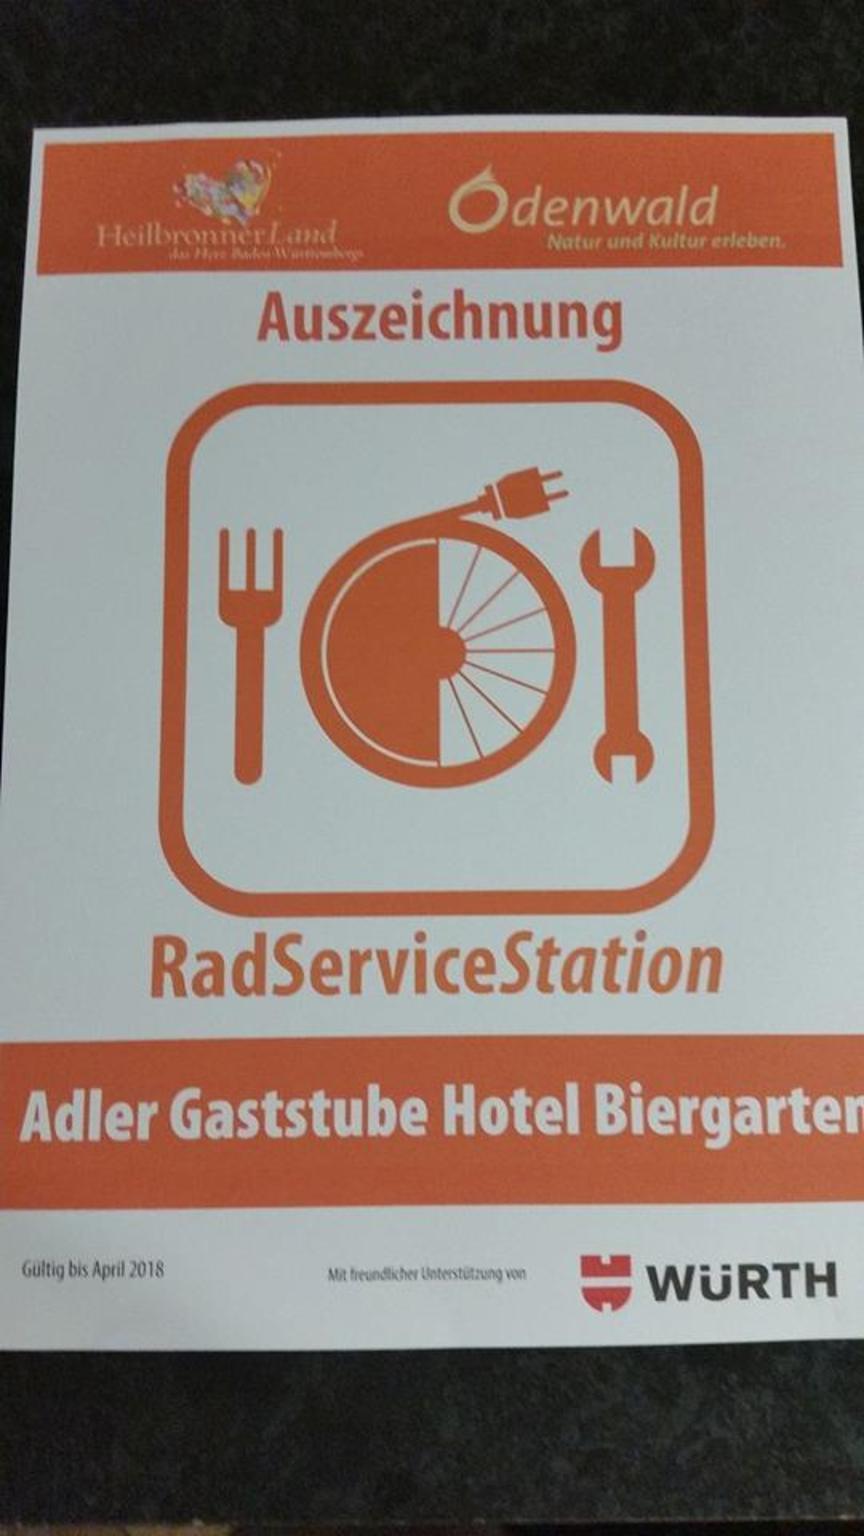 Adler Gaststube Hotel Biergarten, Appartements